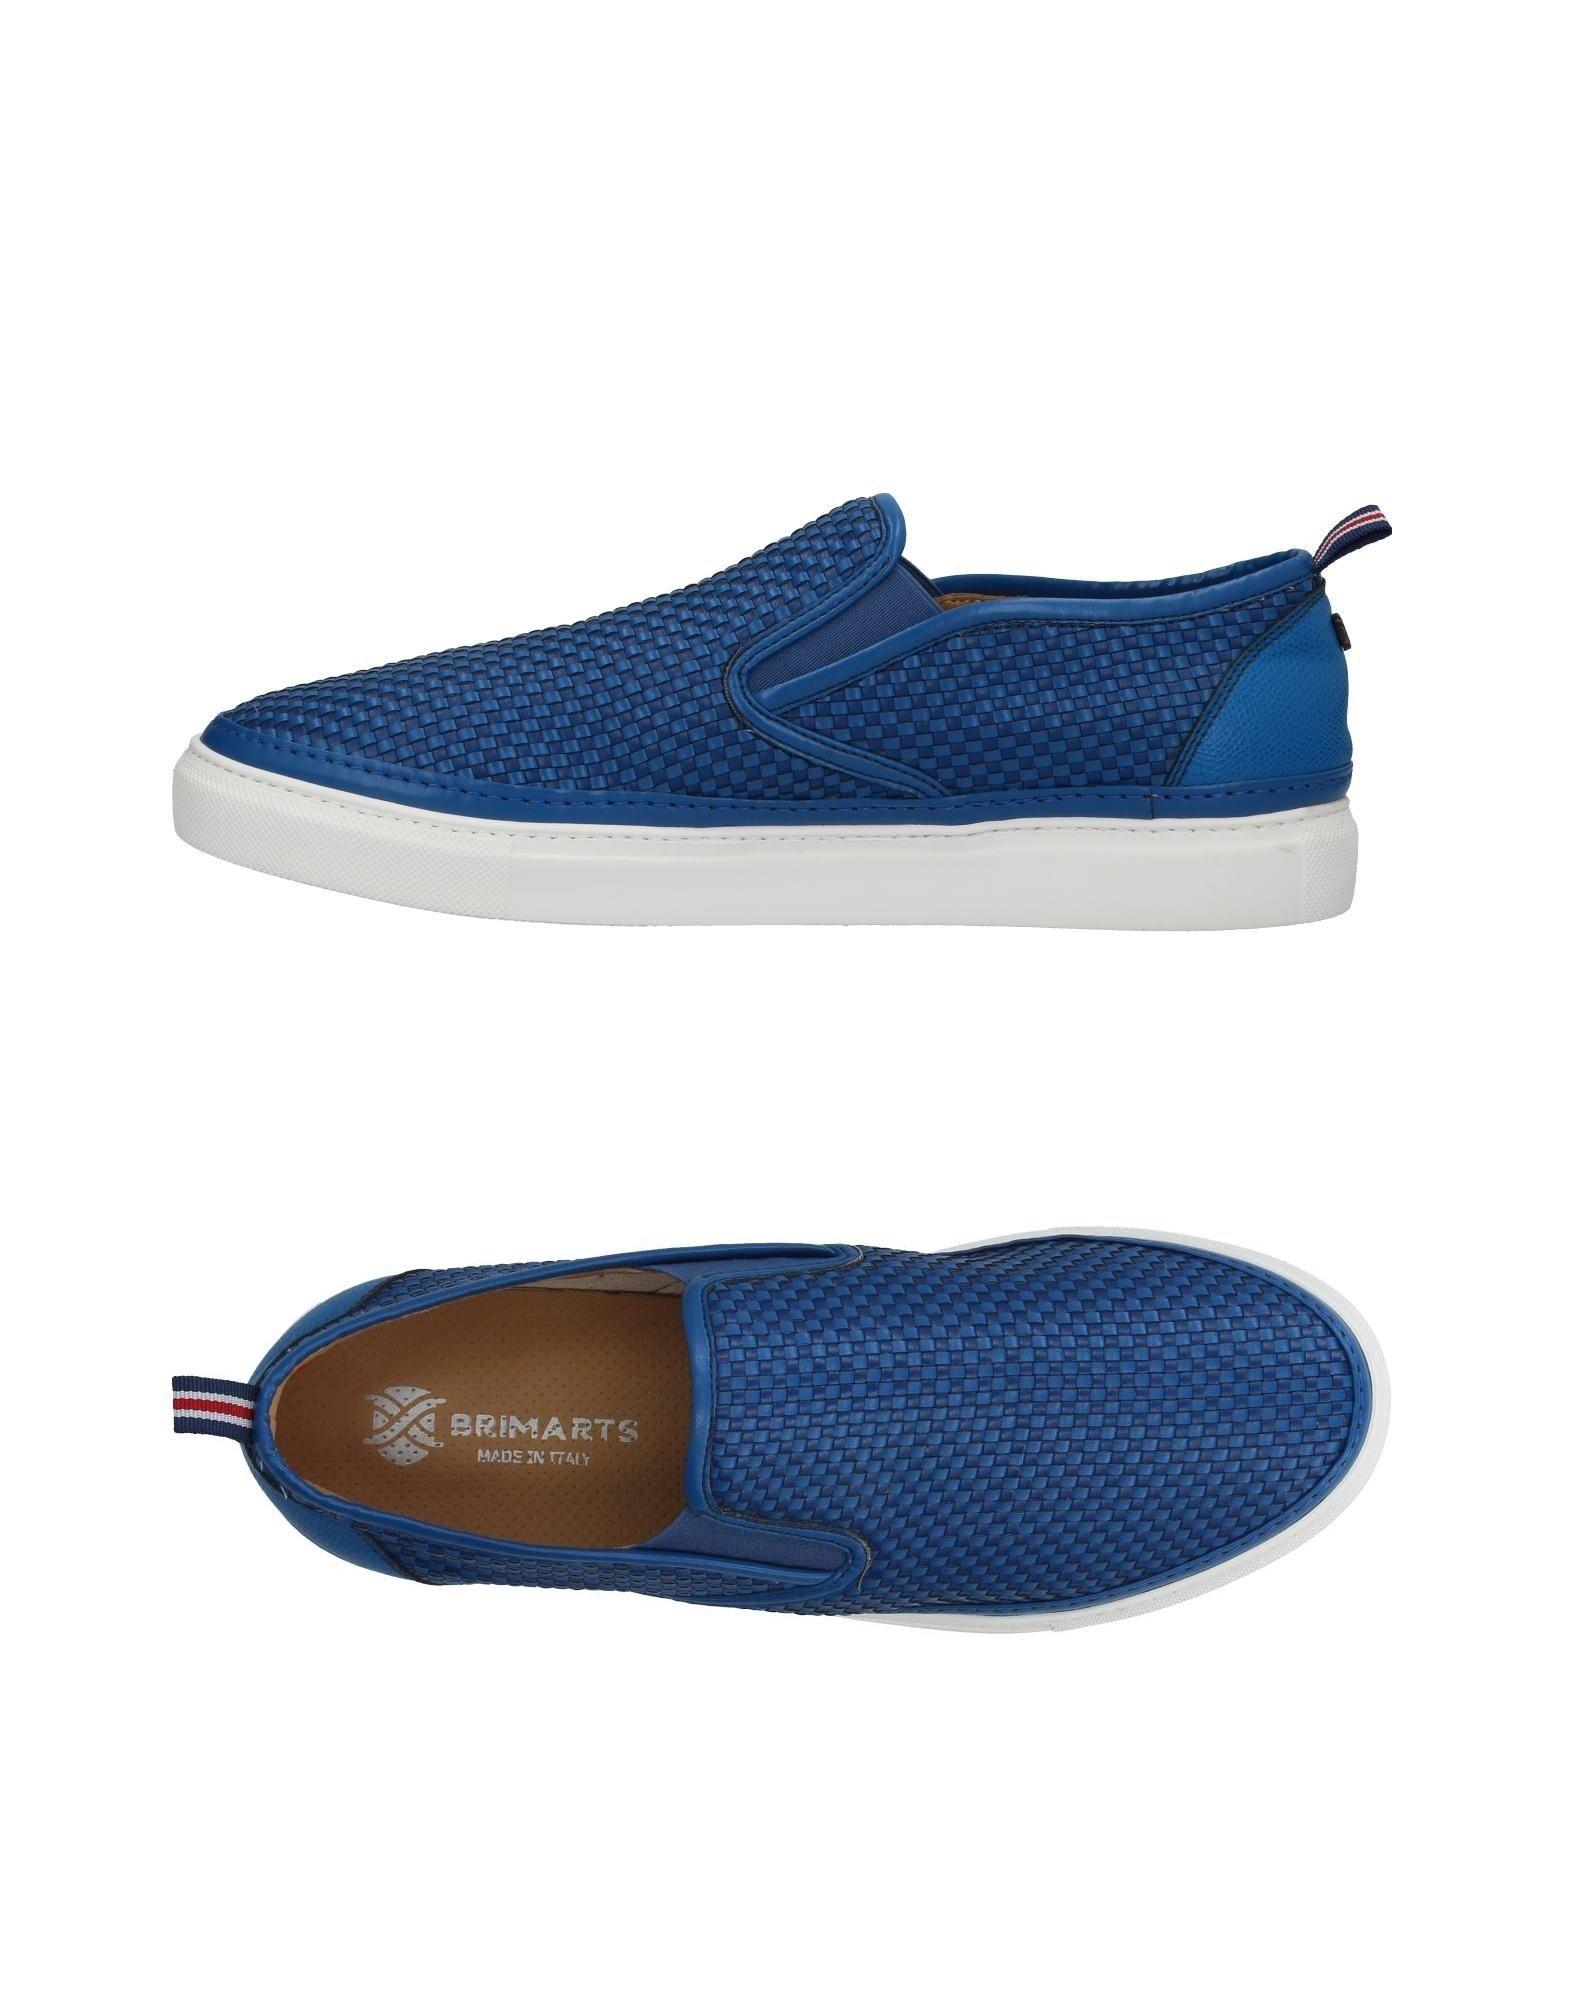 BRIMARTS Sneakers in Blue